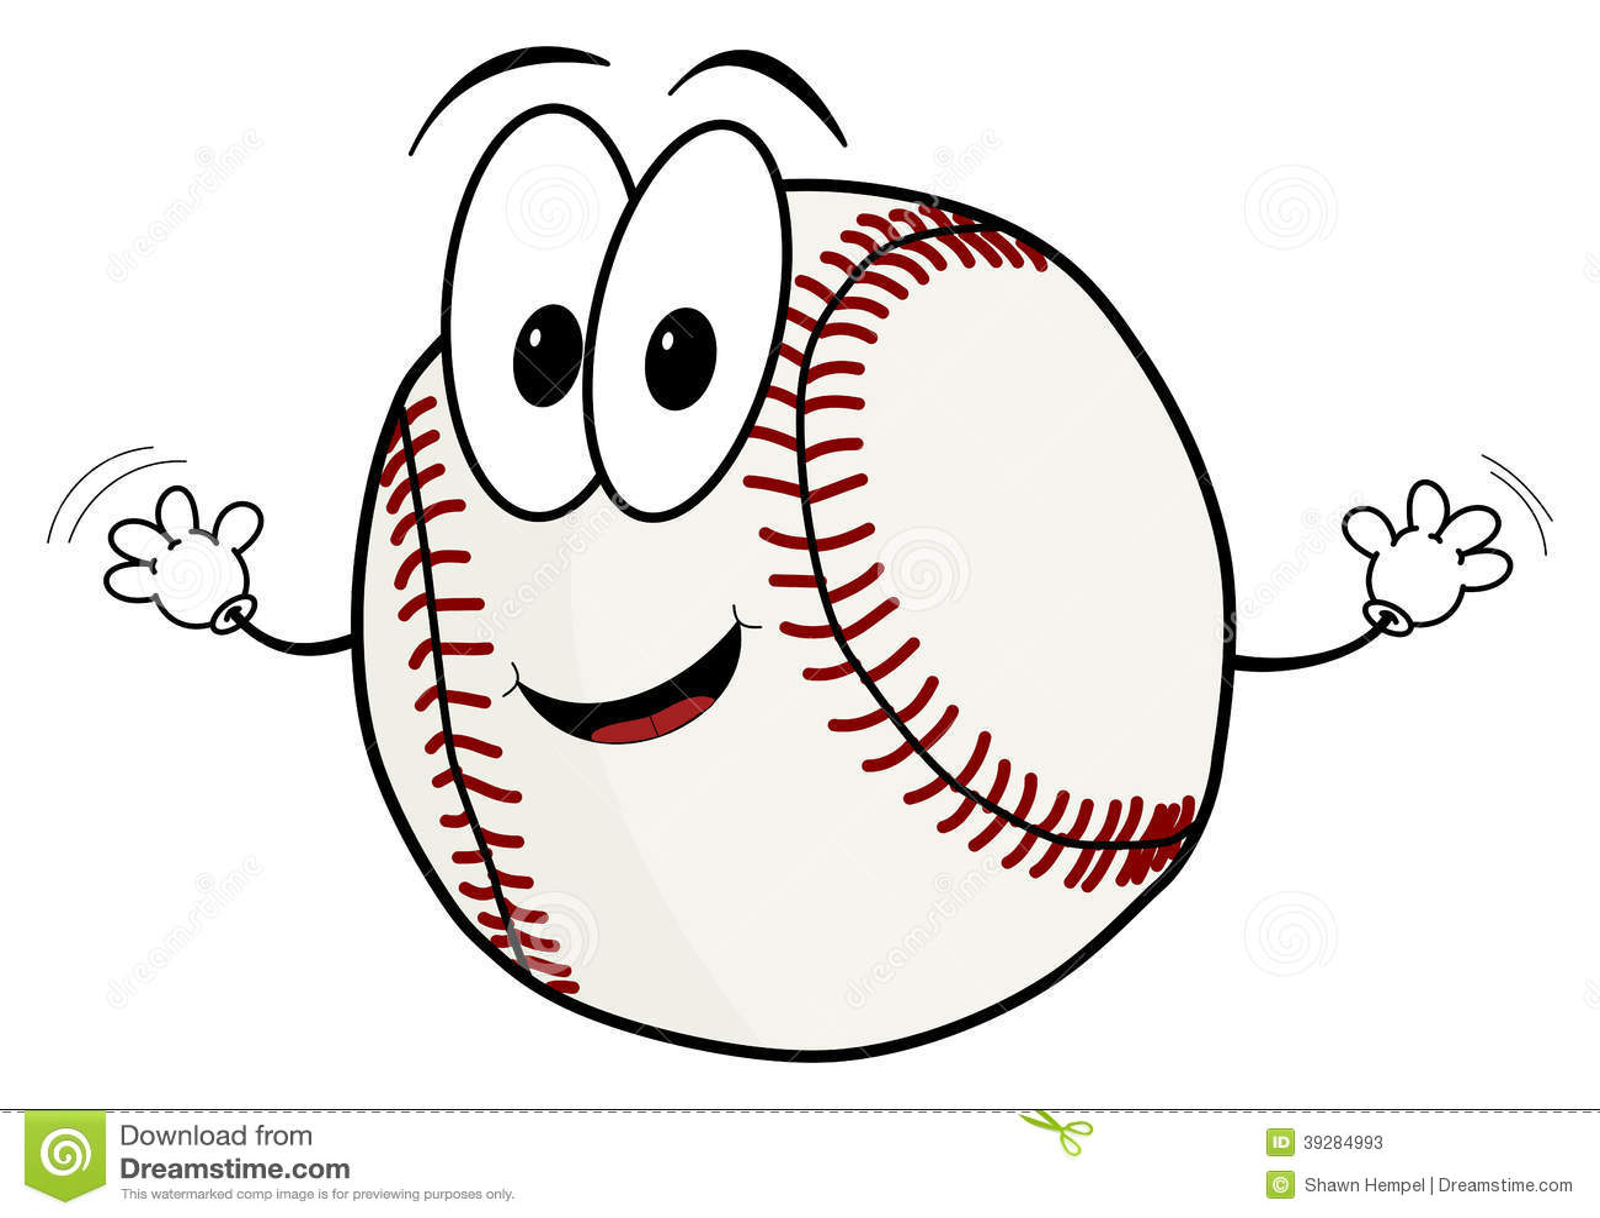 happy cartoon baseball character illustration 39284993 megapixl rh megapixl com Cartoon Baseball Drawings Cartoon Baseball Drawings